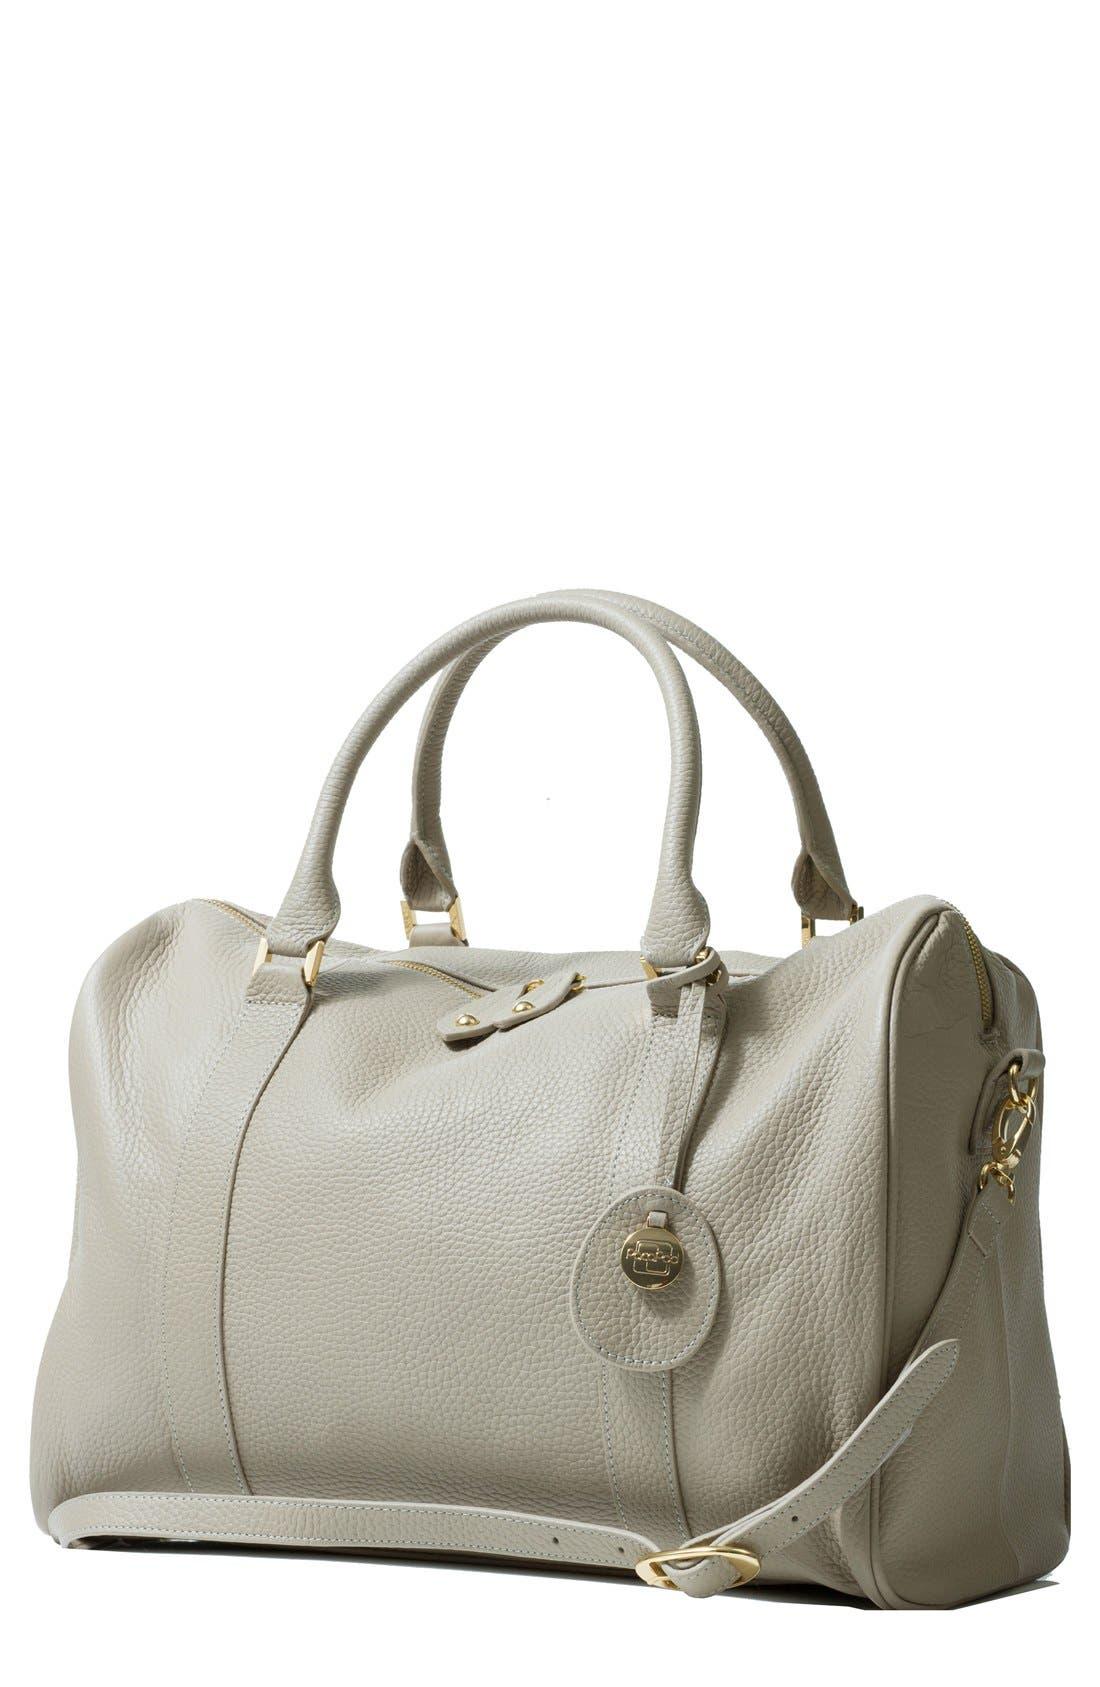 PacaPod 'Firenze' Leather Diaper Bag